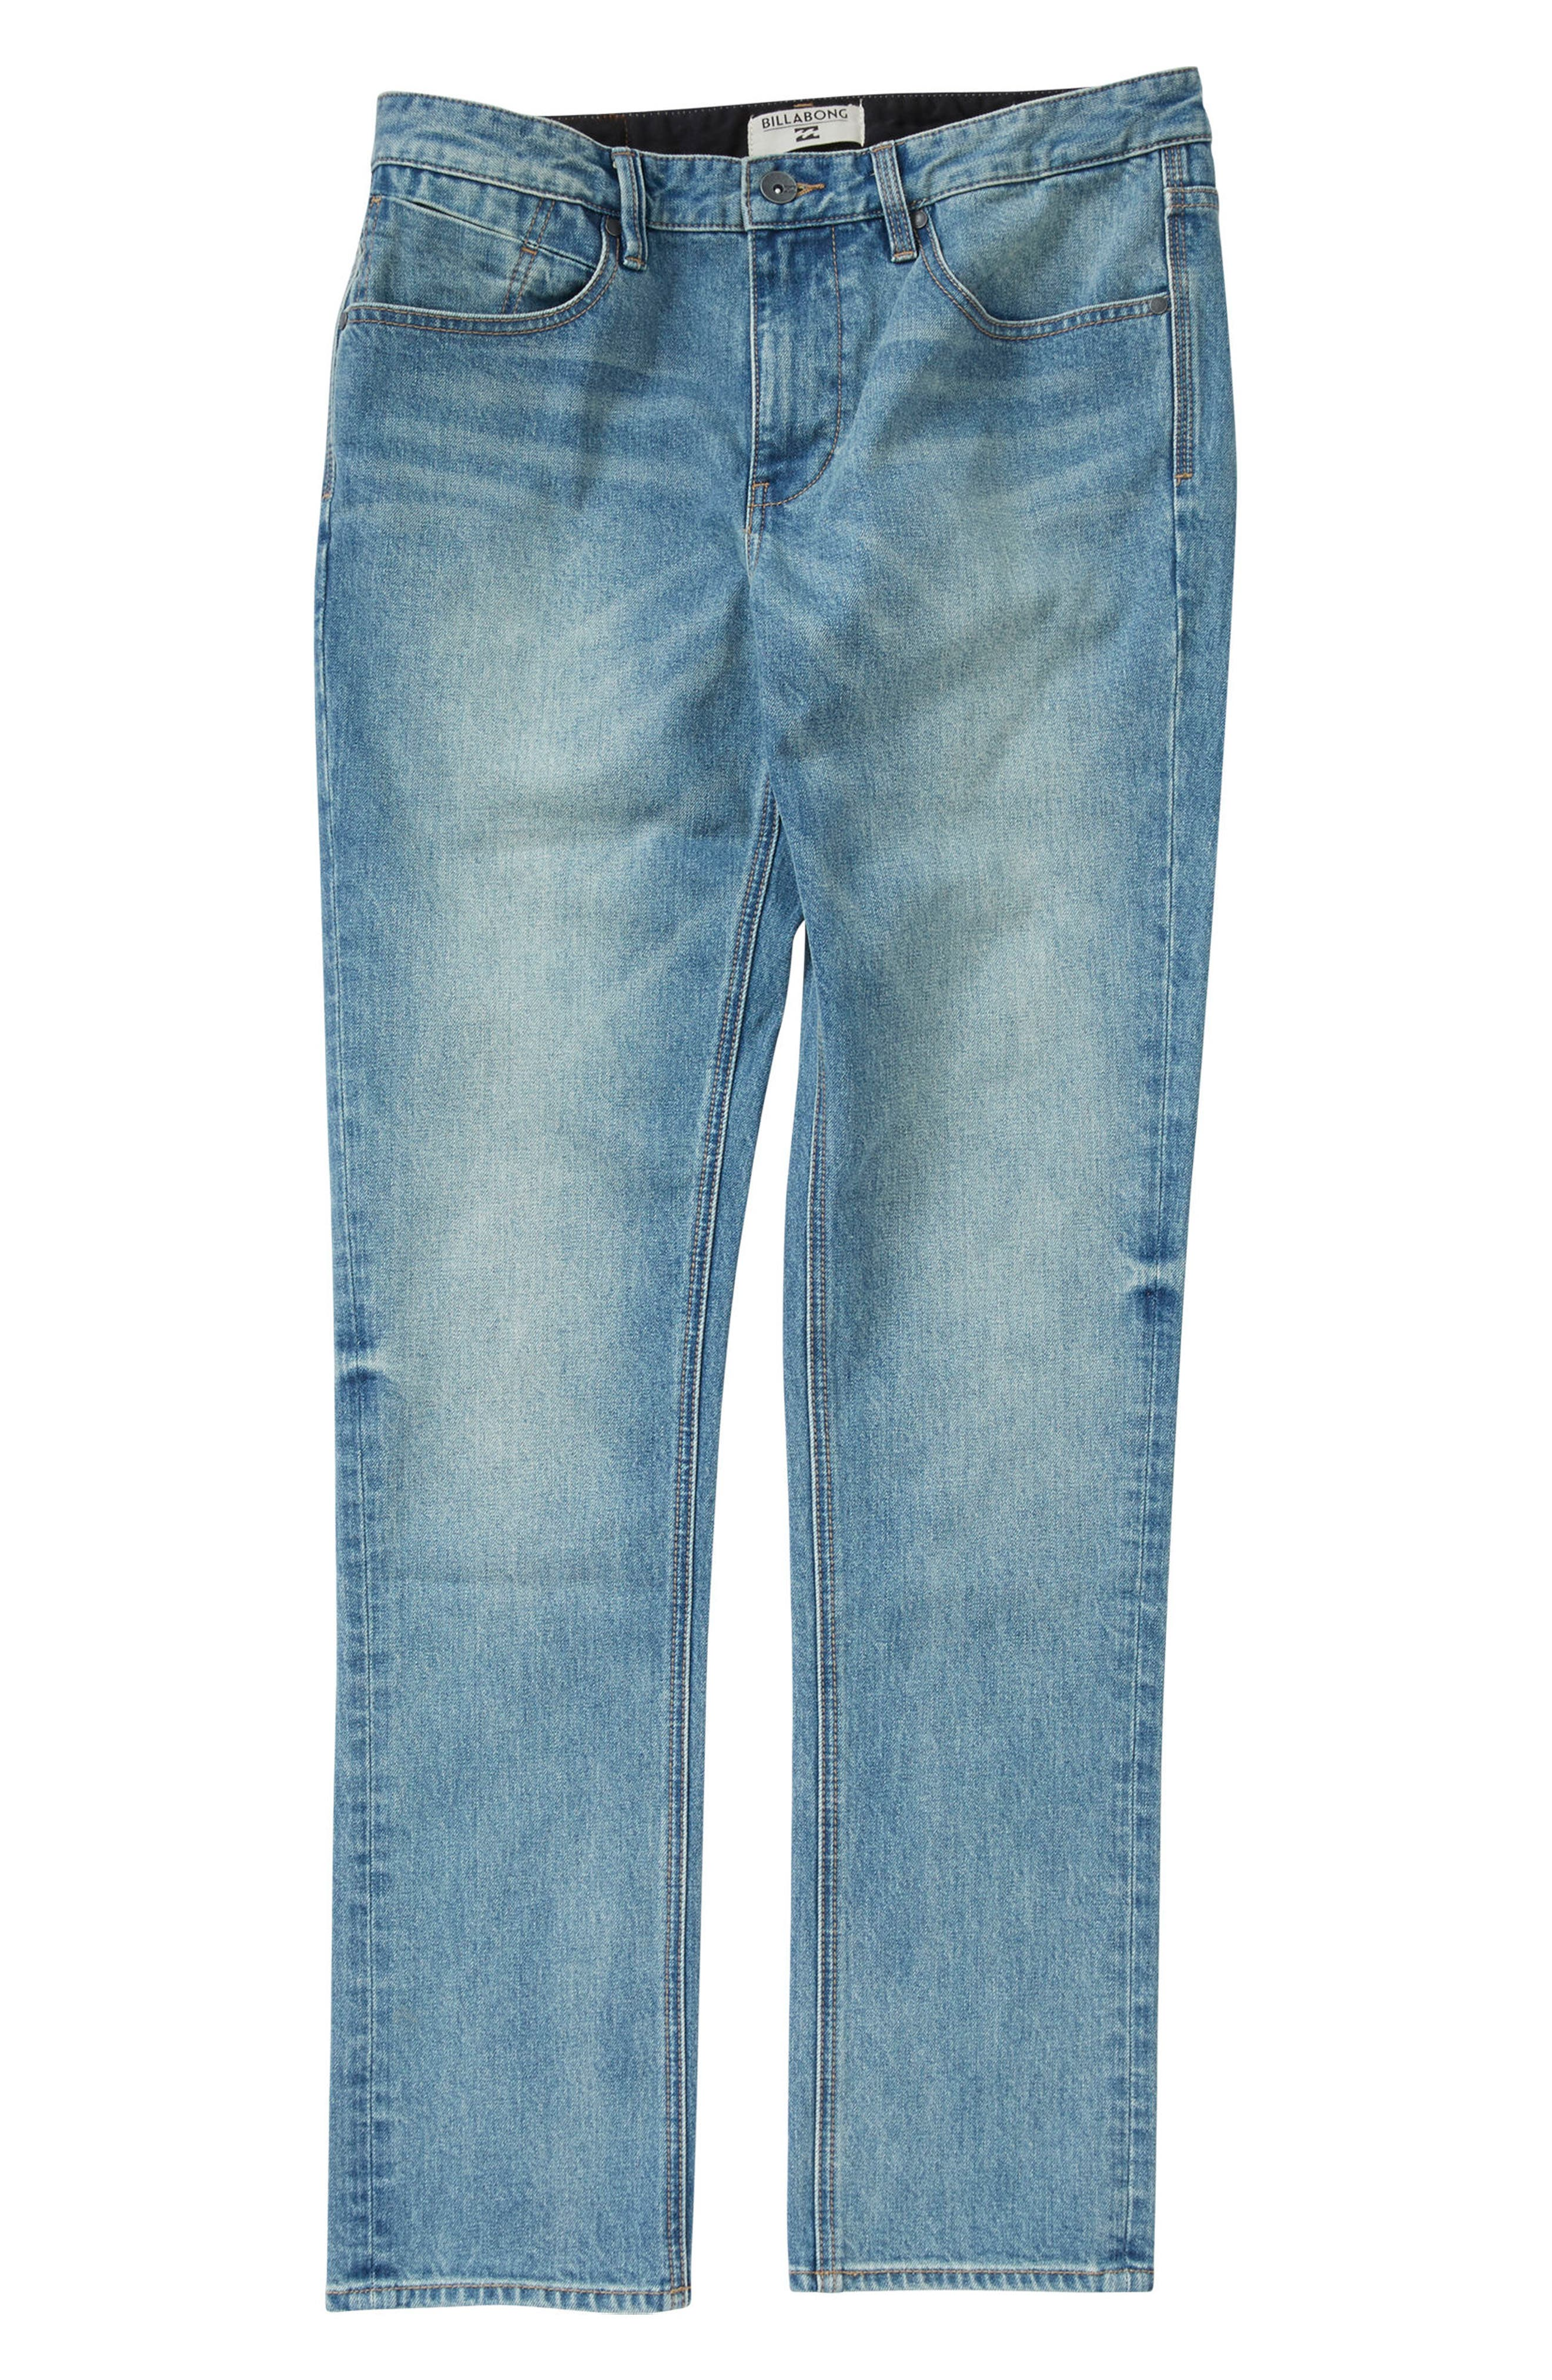 Alternate Image 1 Selected - Billabong Outsider Jeans (Big Boys)